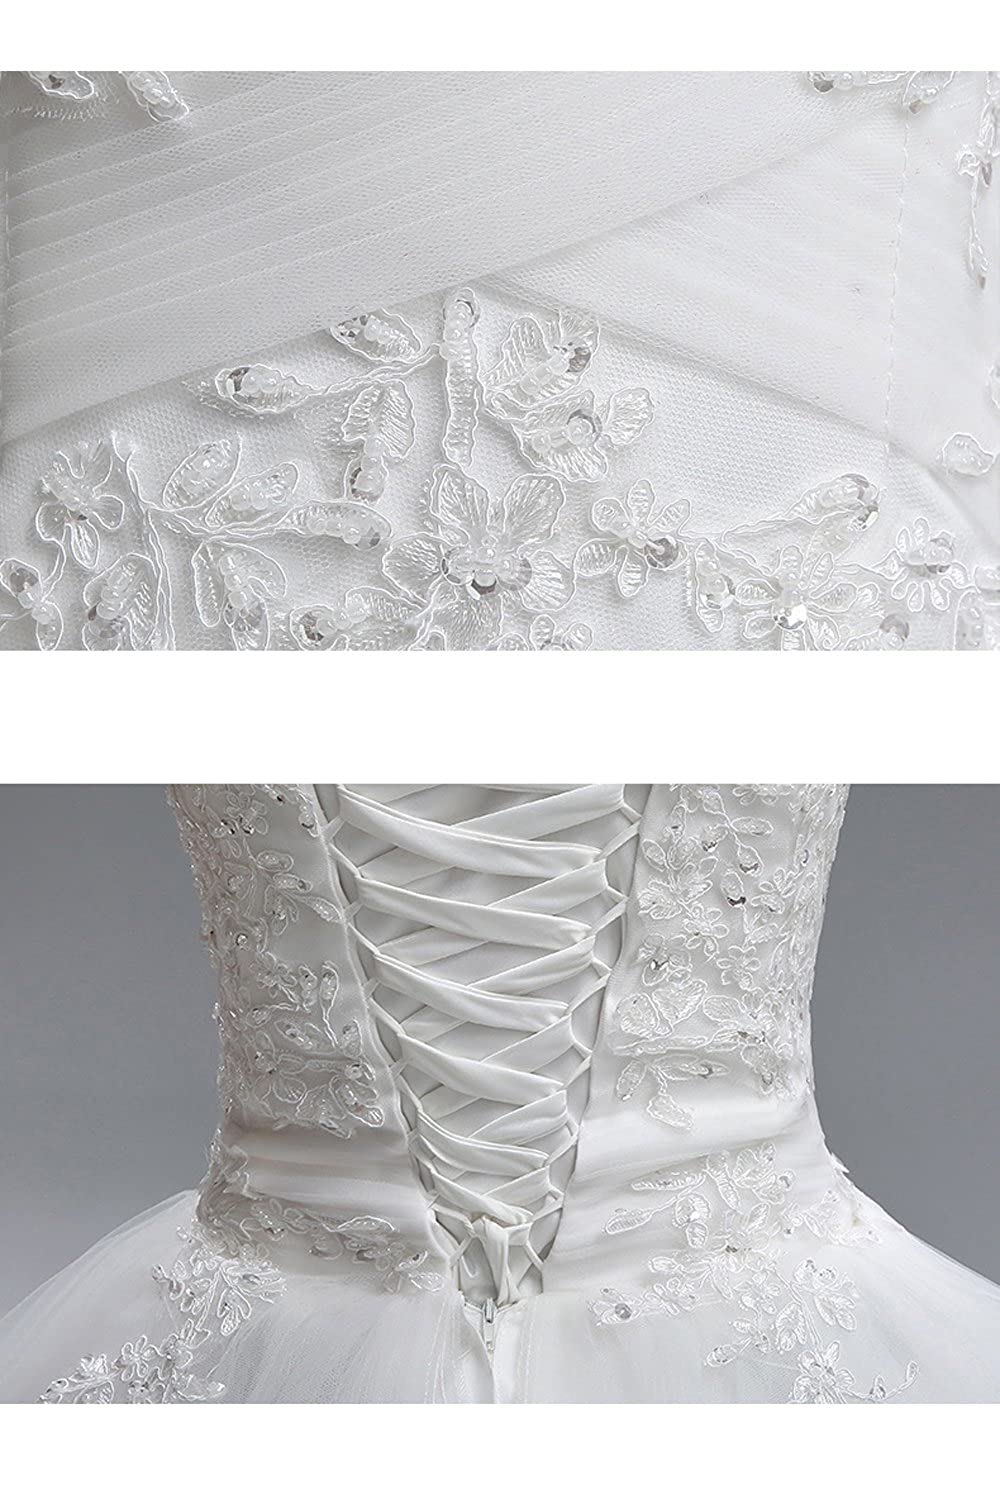 White Off The Shoulder Ball Gown Wedding Dress for Bride Wedding Bride Dress